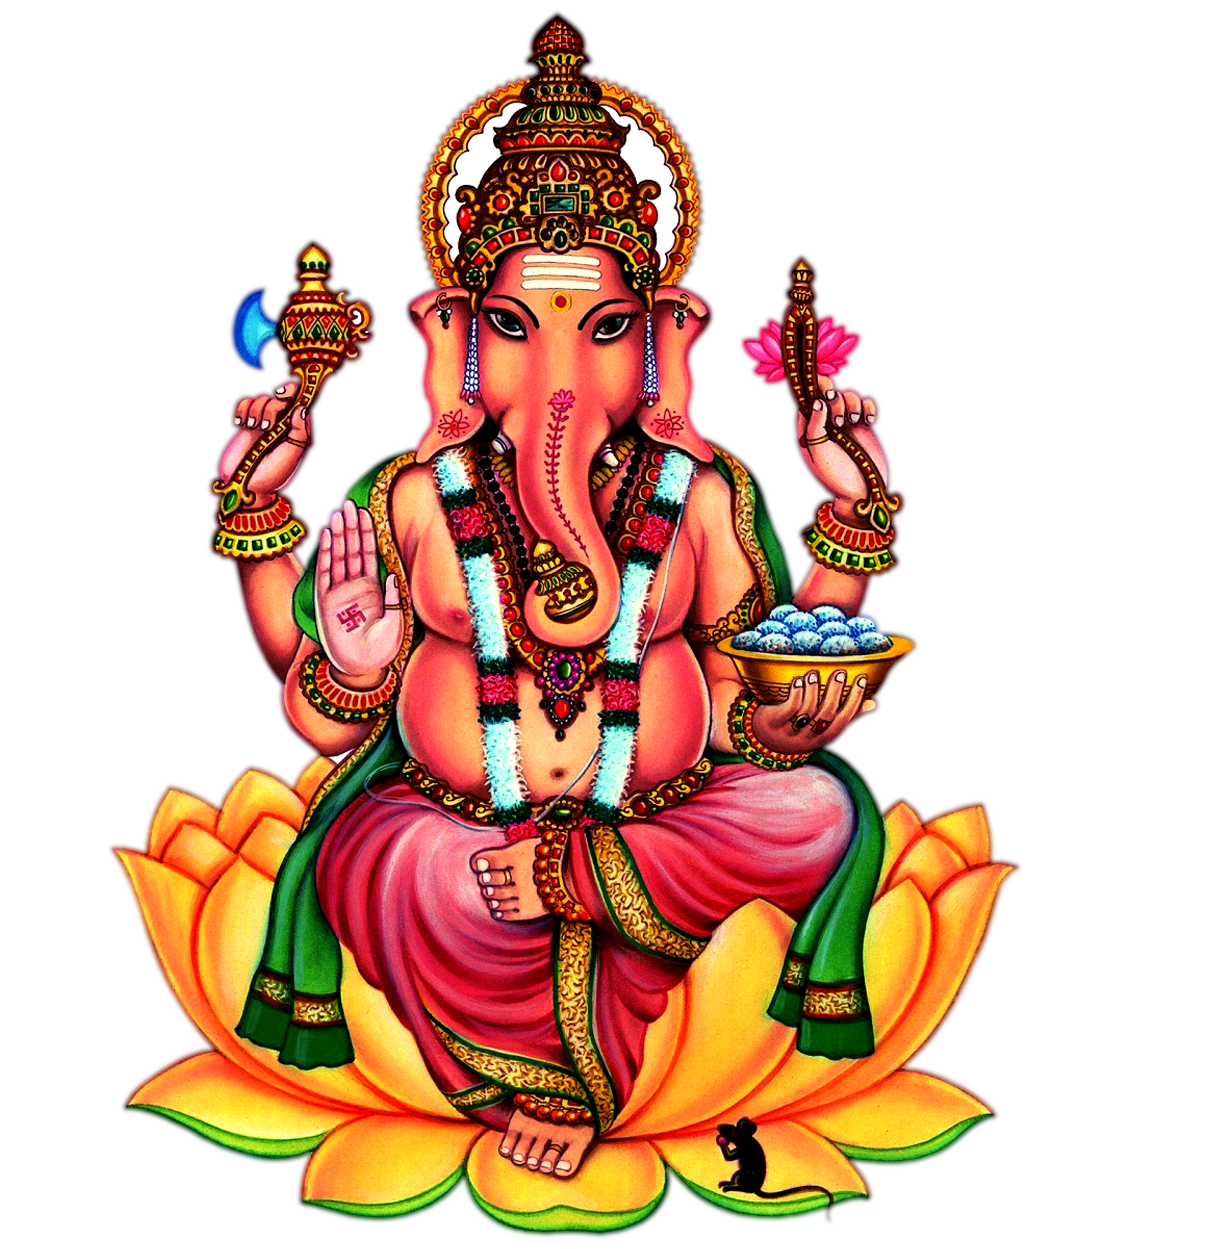 Sri Ganesh Png - Ganesha Png Images Transparent Free, Transparent background PNG HD thumbnail